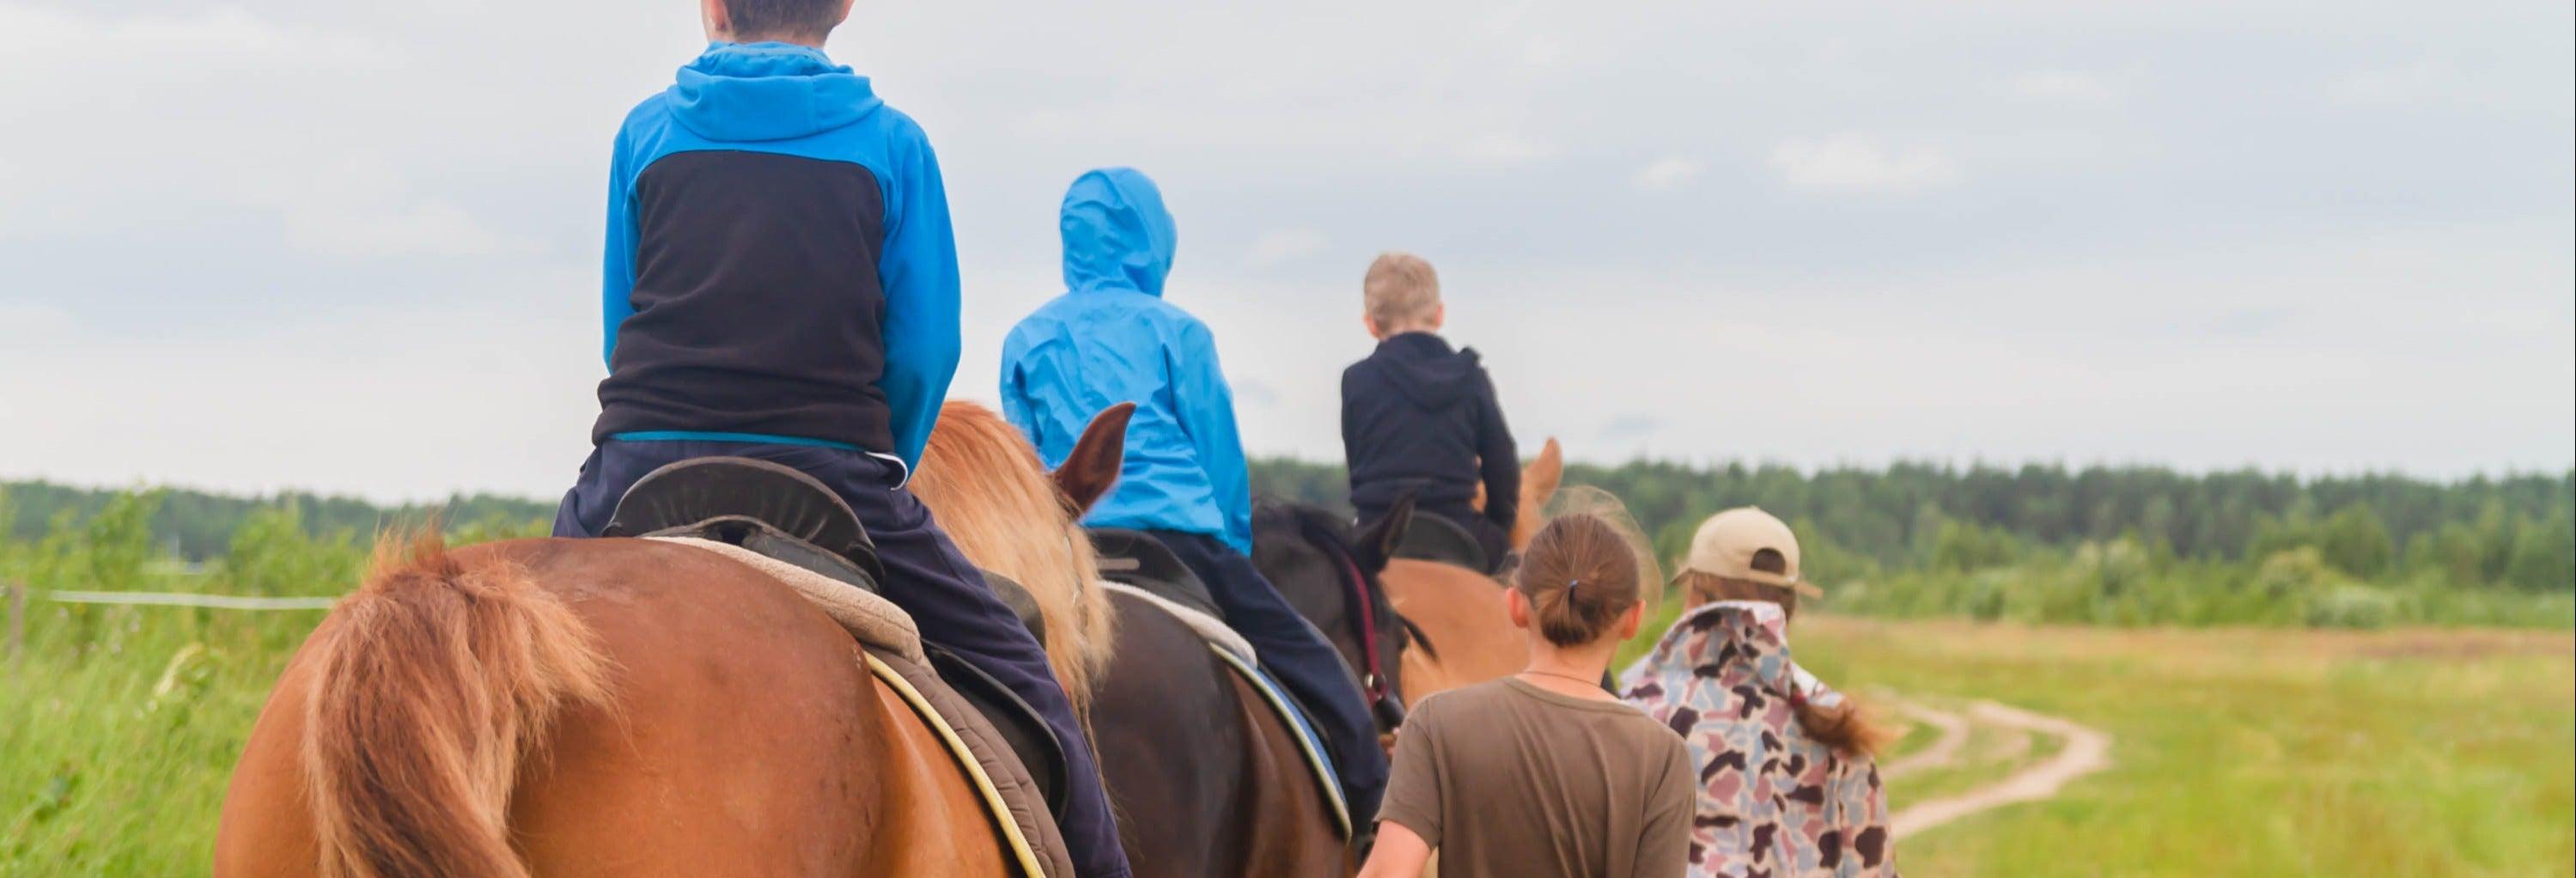 Tour de bicicleta e passeio a cavalo + Churrasco argentino